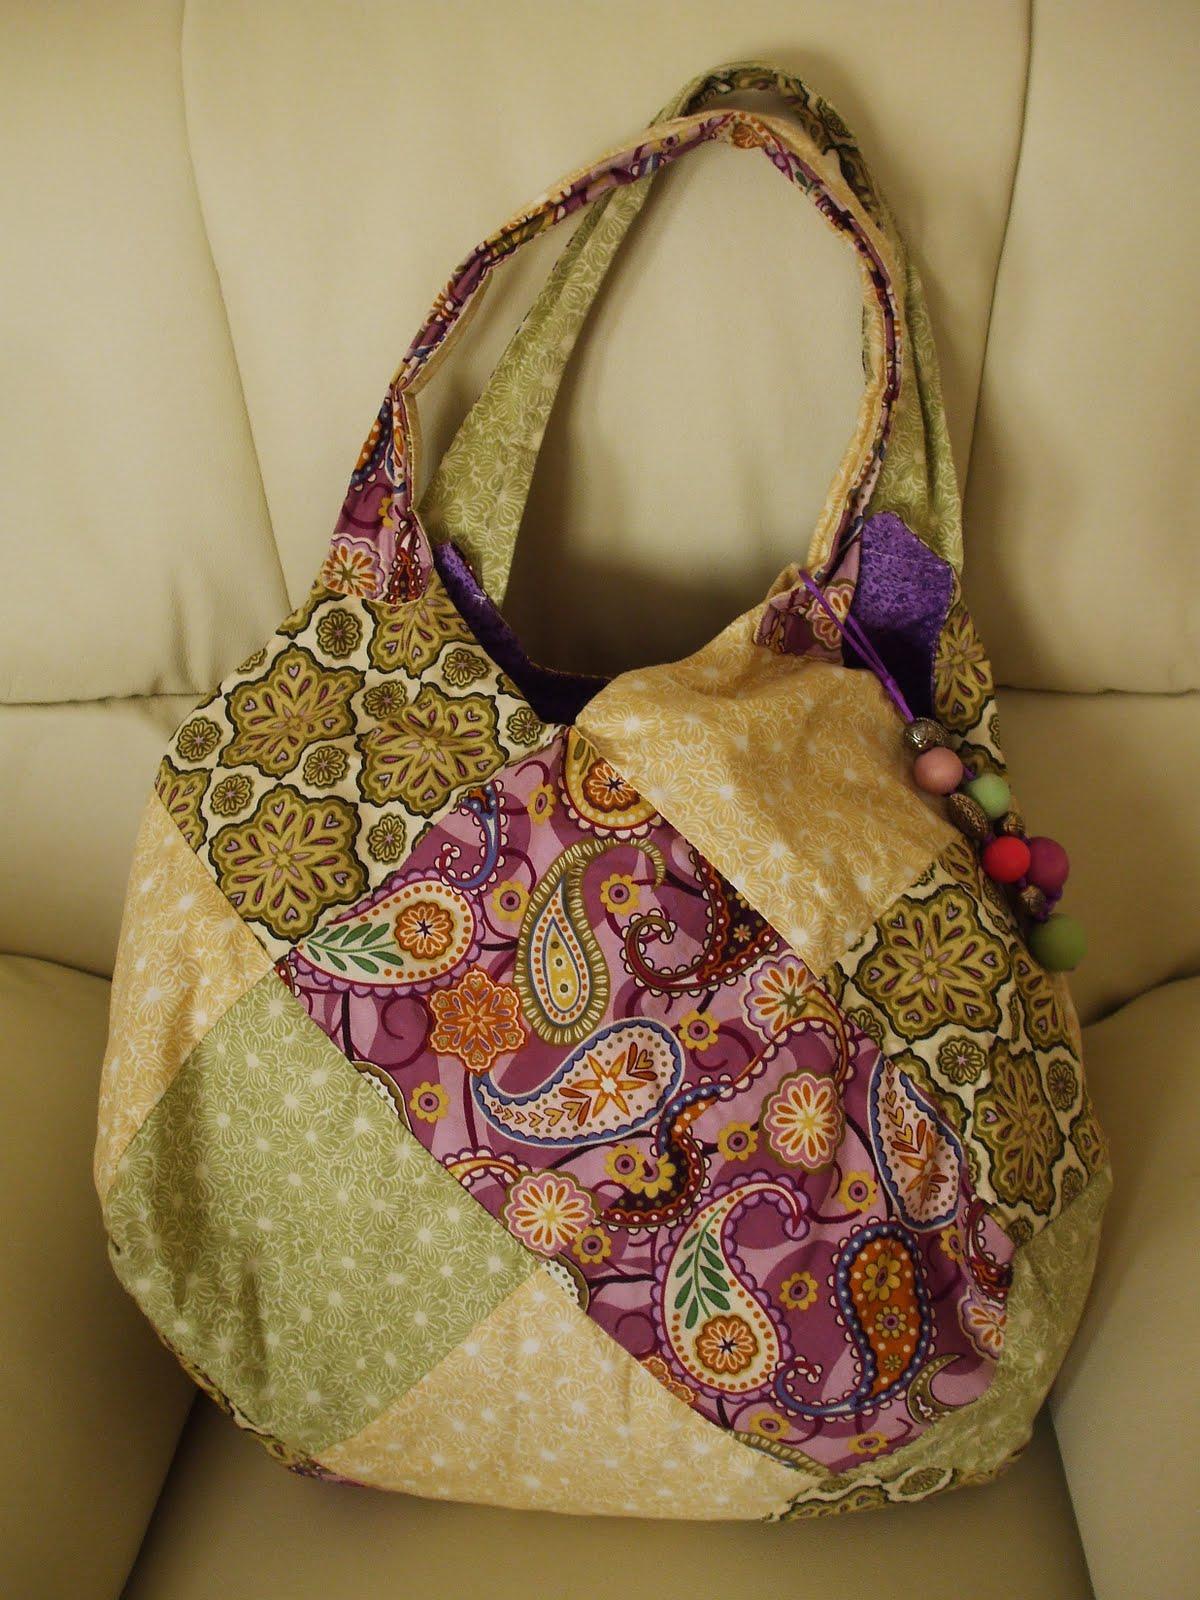 Pinta cose colorea bolso de patchwork - Manualidades patchwork bolsos ...